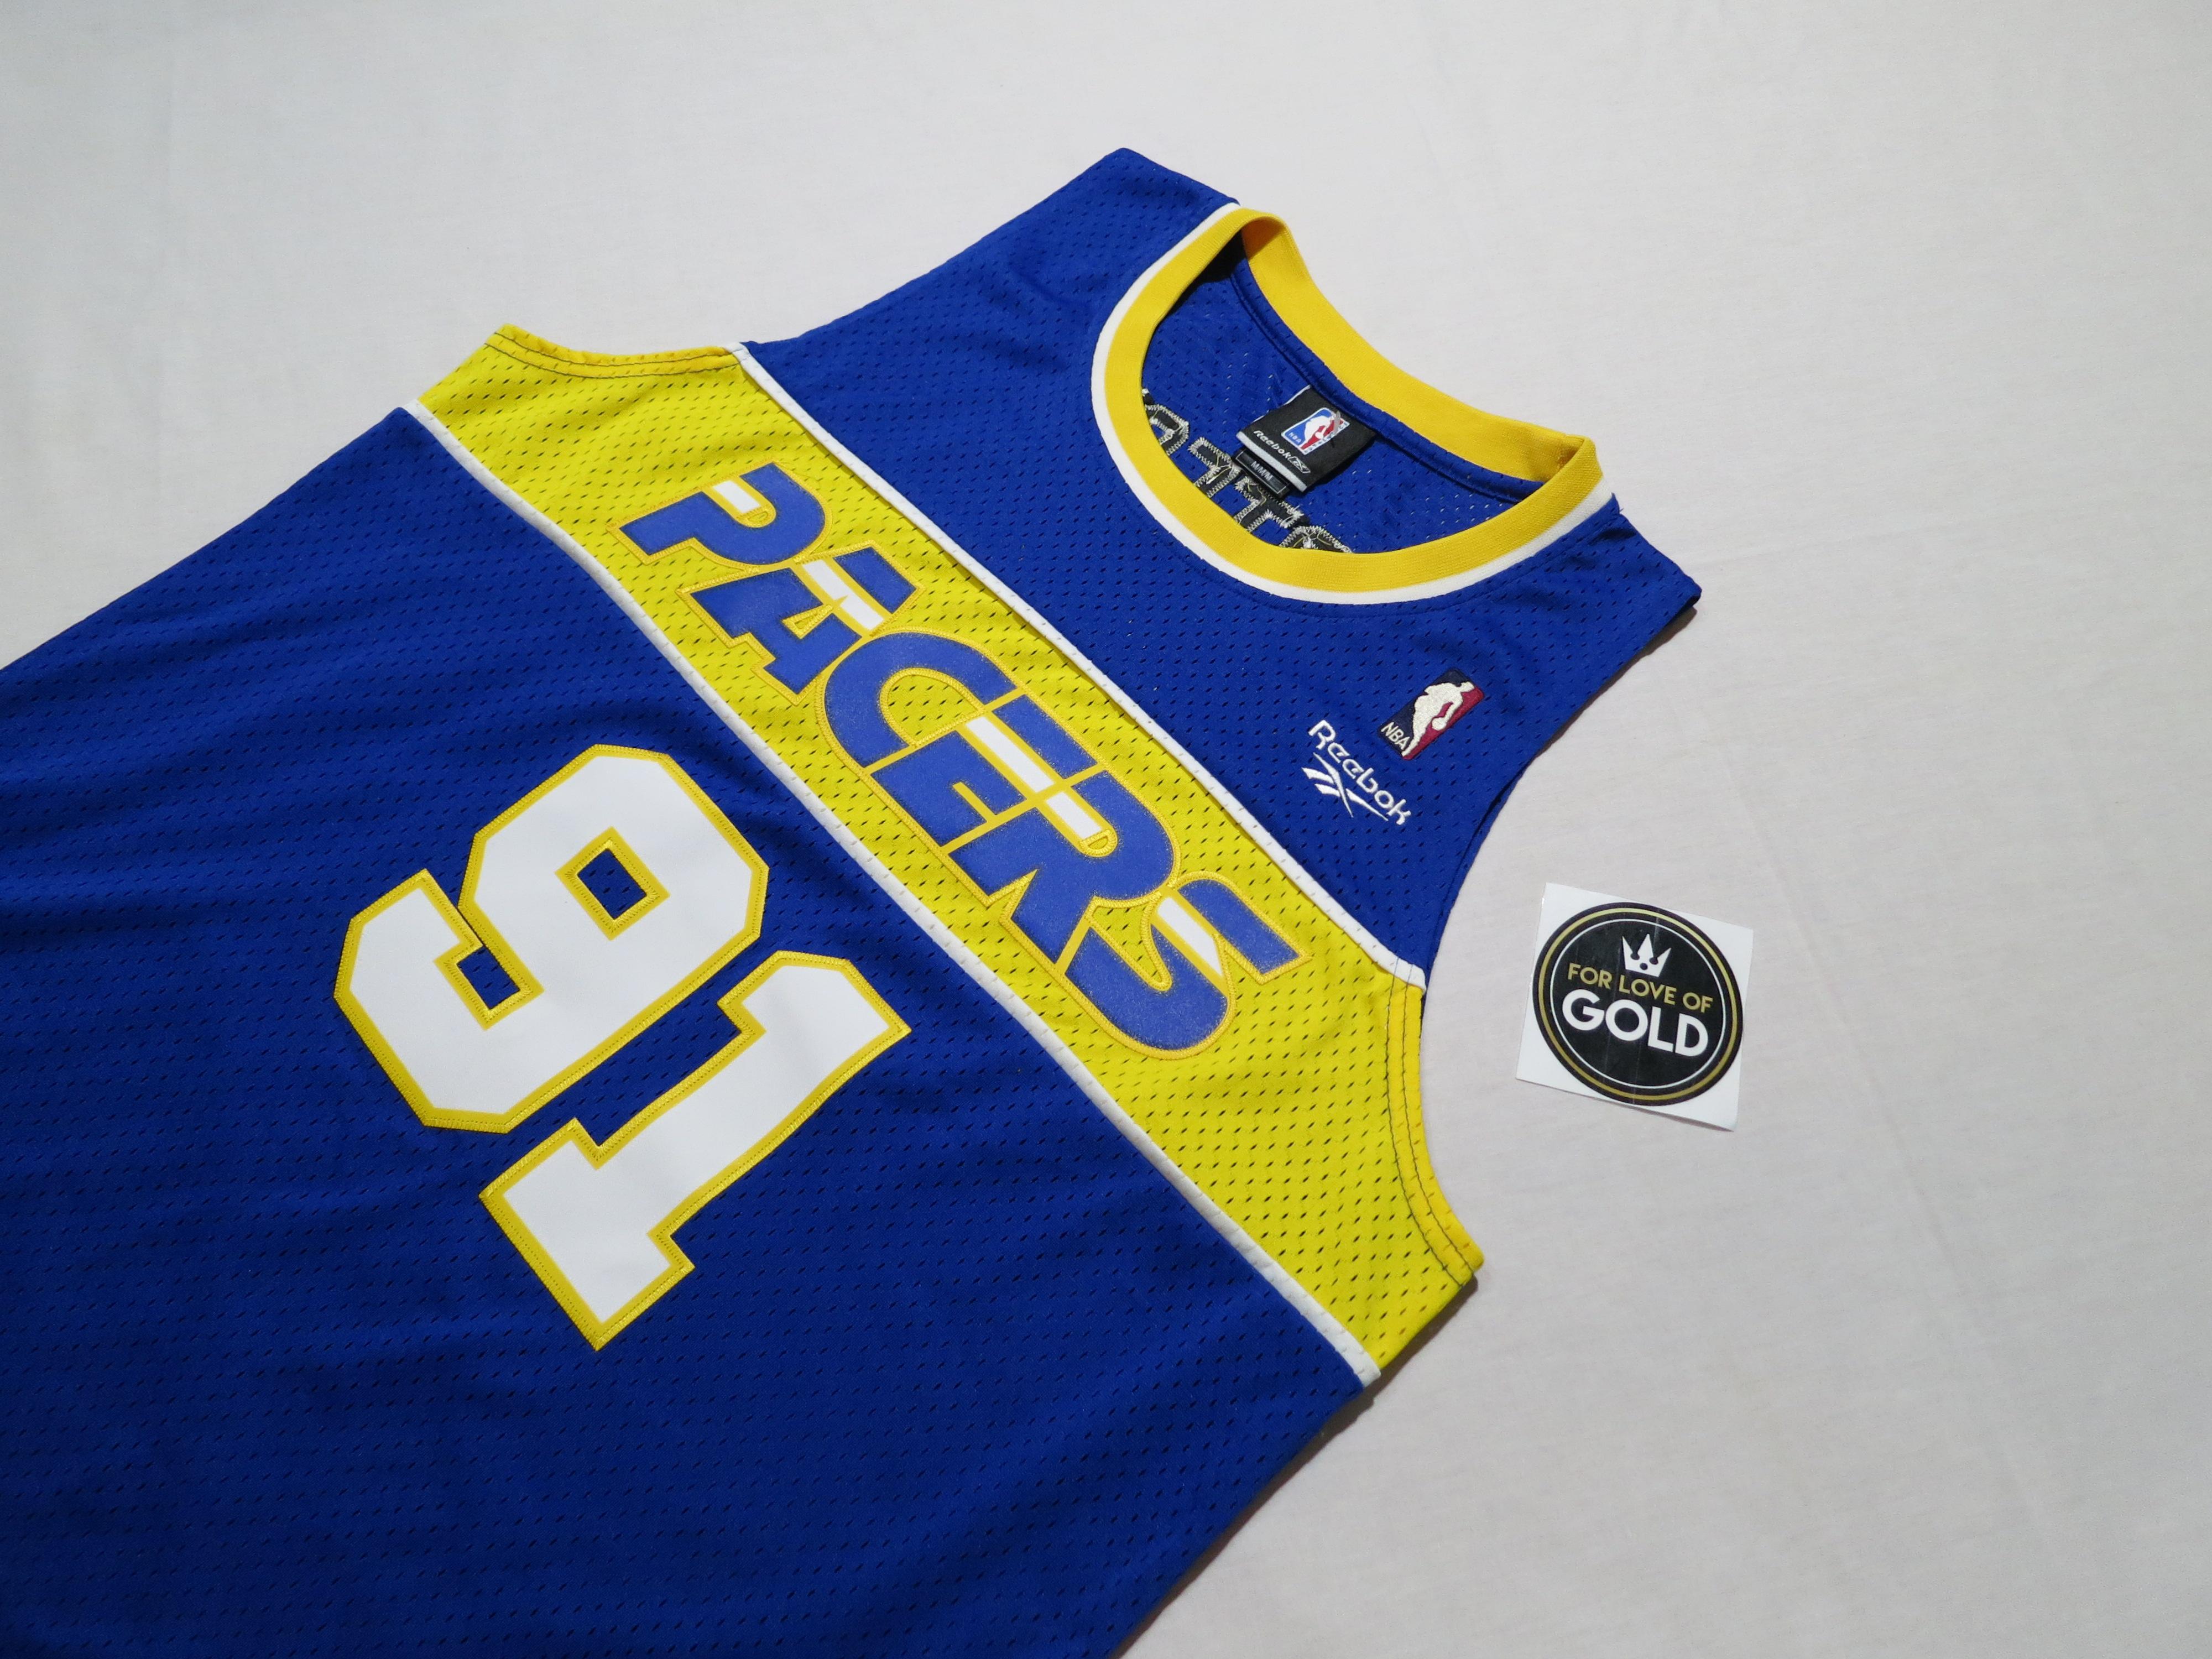 meet 57caf 3e8e3 Vintage Indiana Pacers Ron Artest Hardwood Classics Reebok basketball jersey